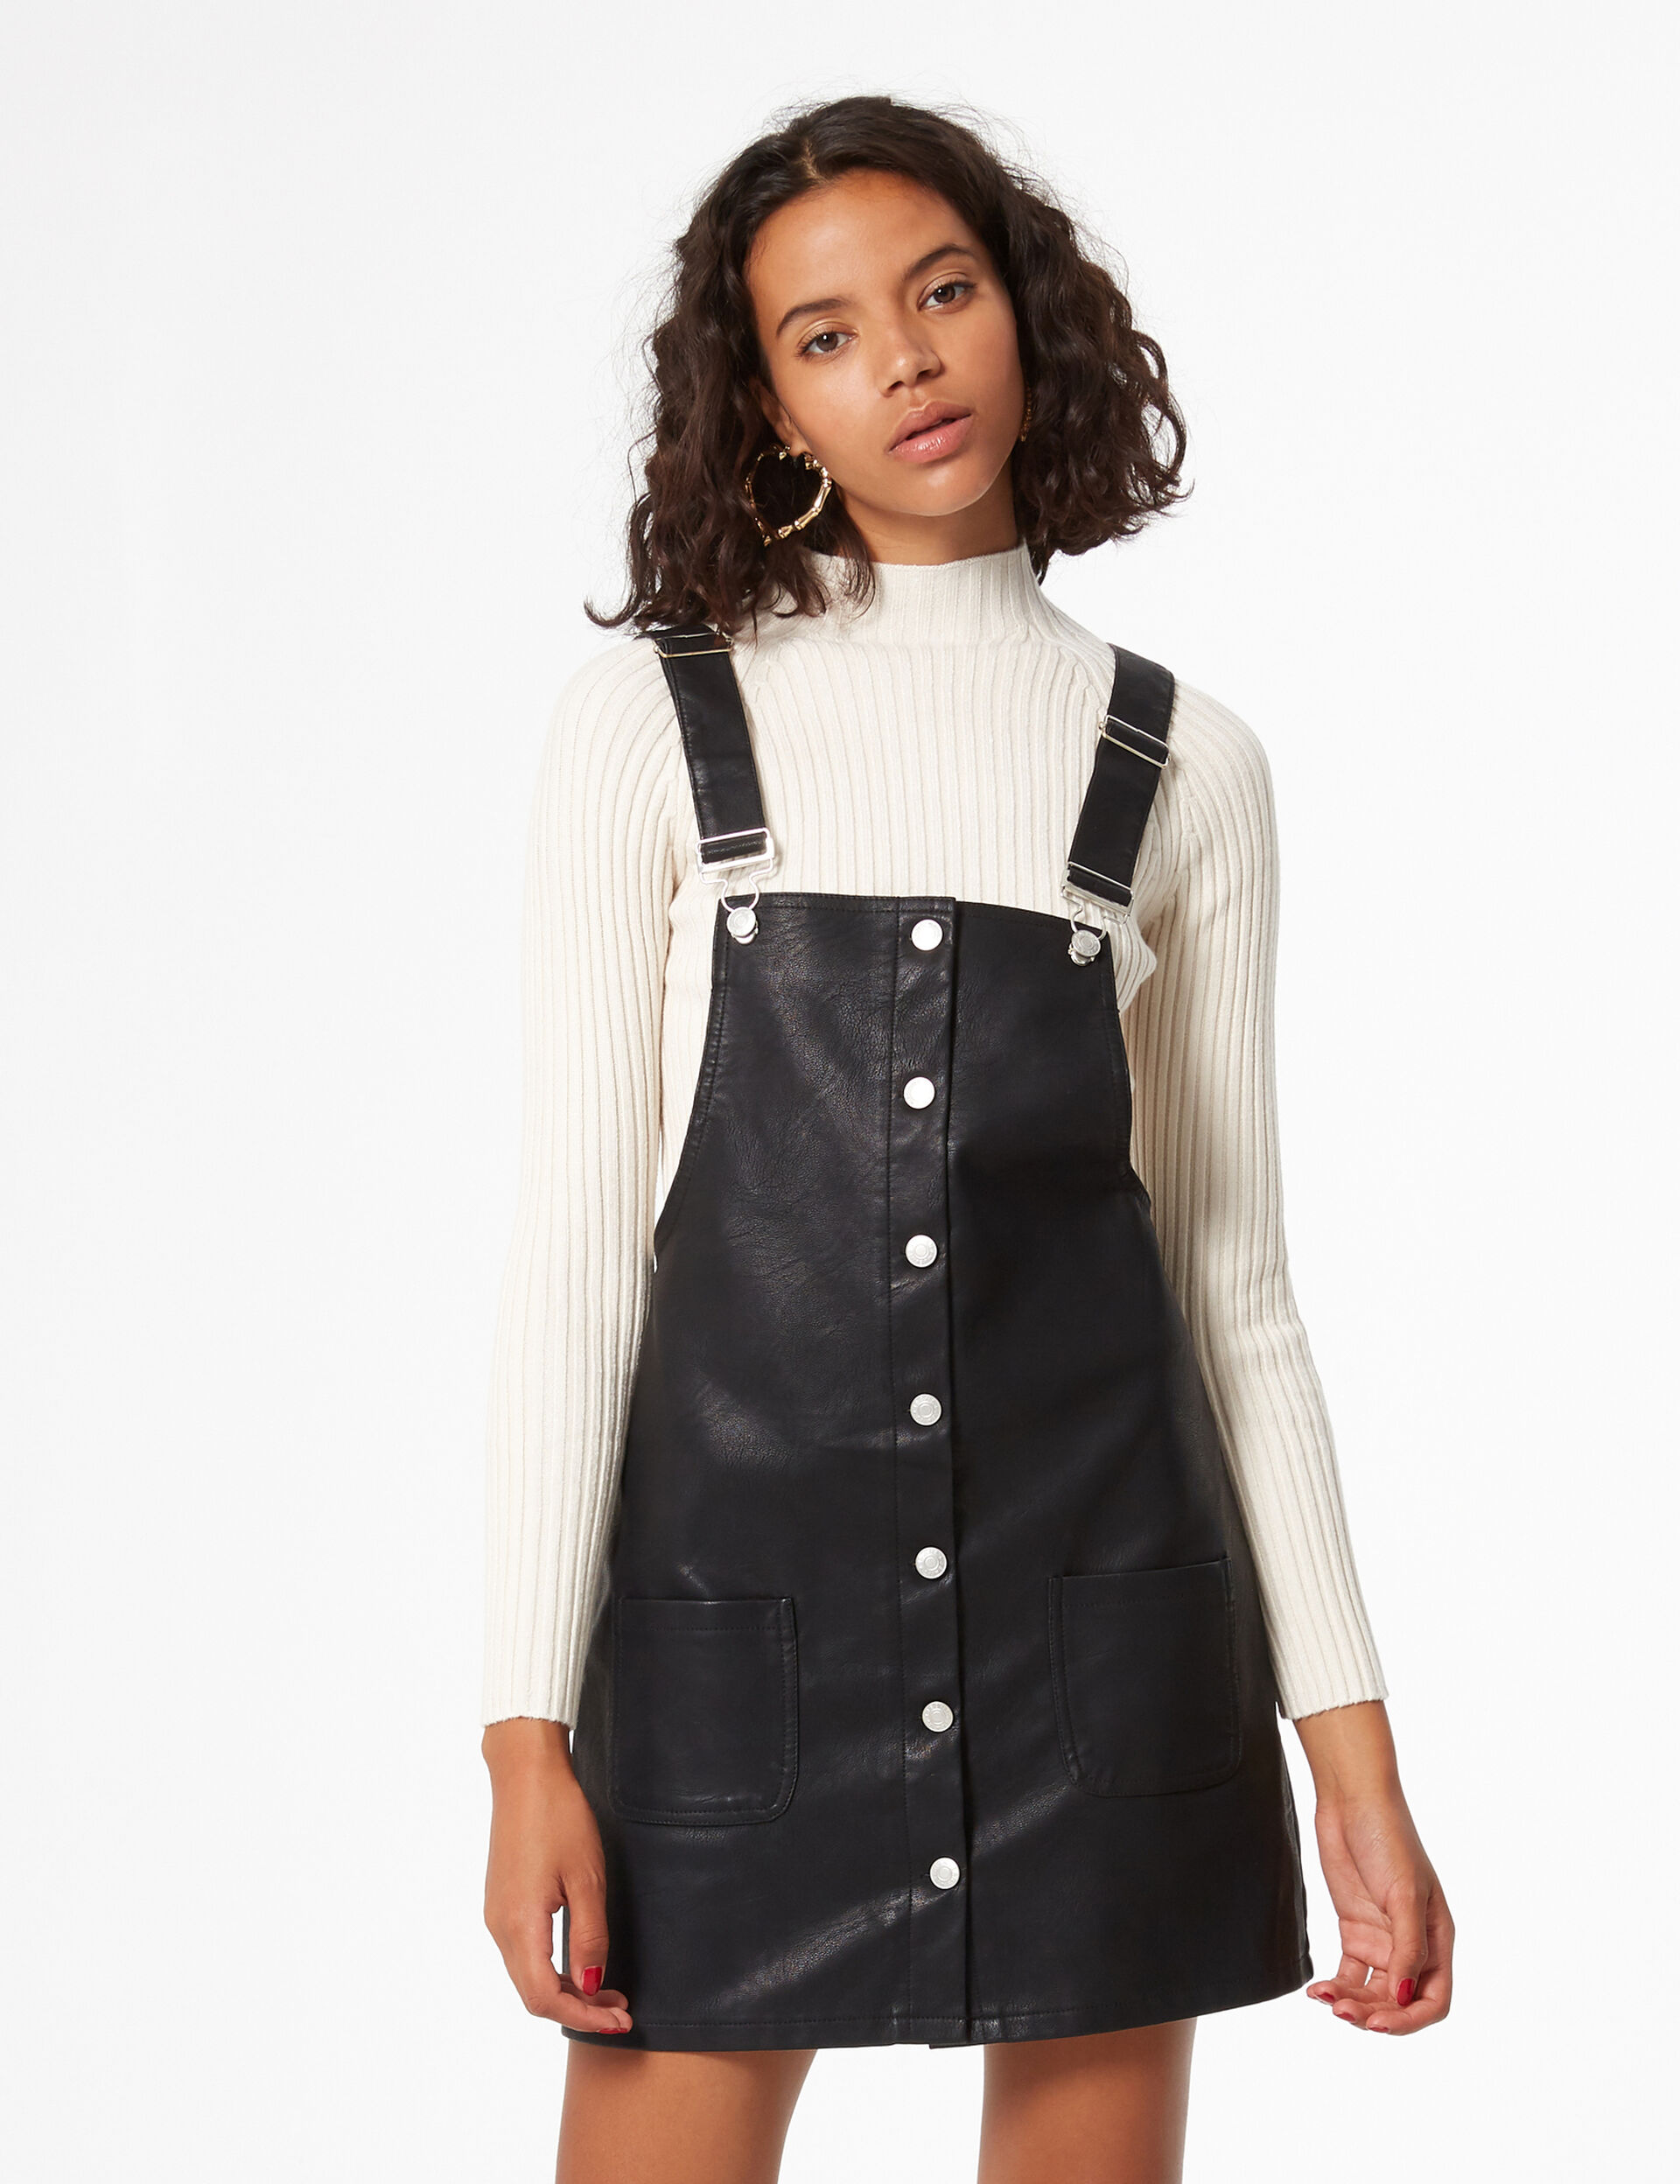 Synthetic tunic dress